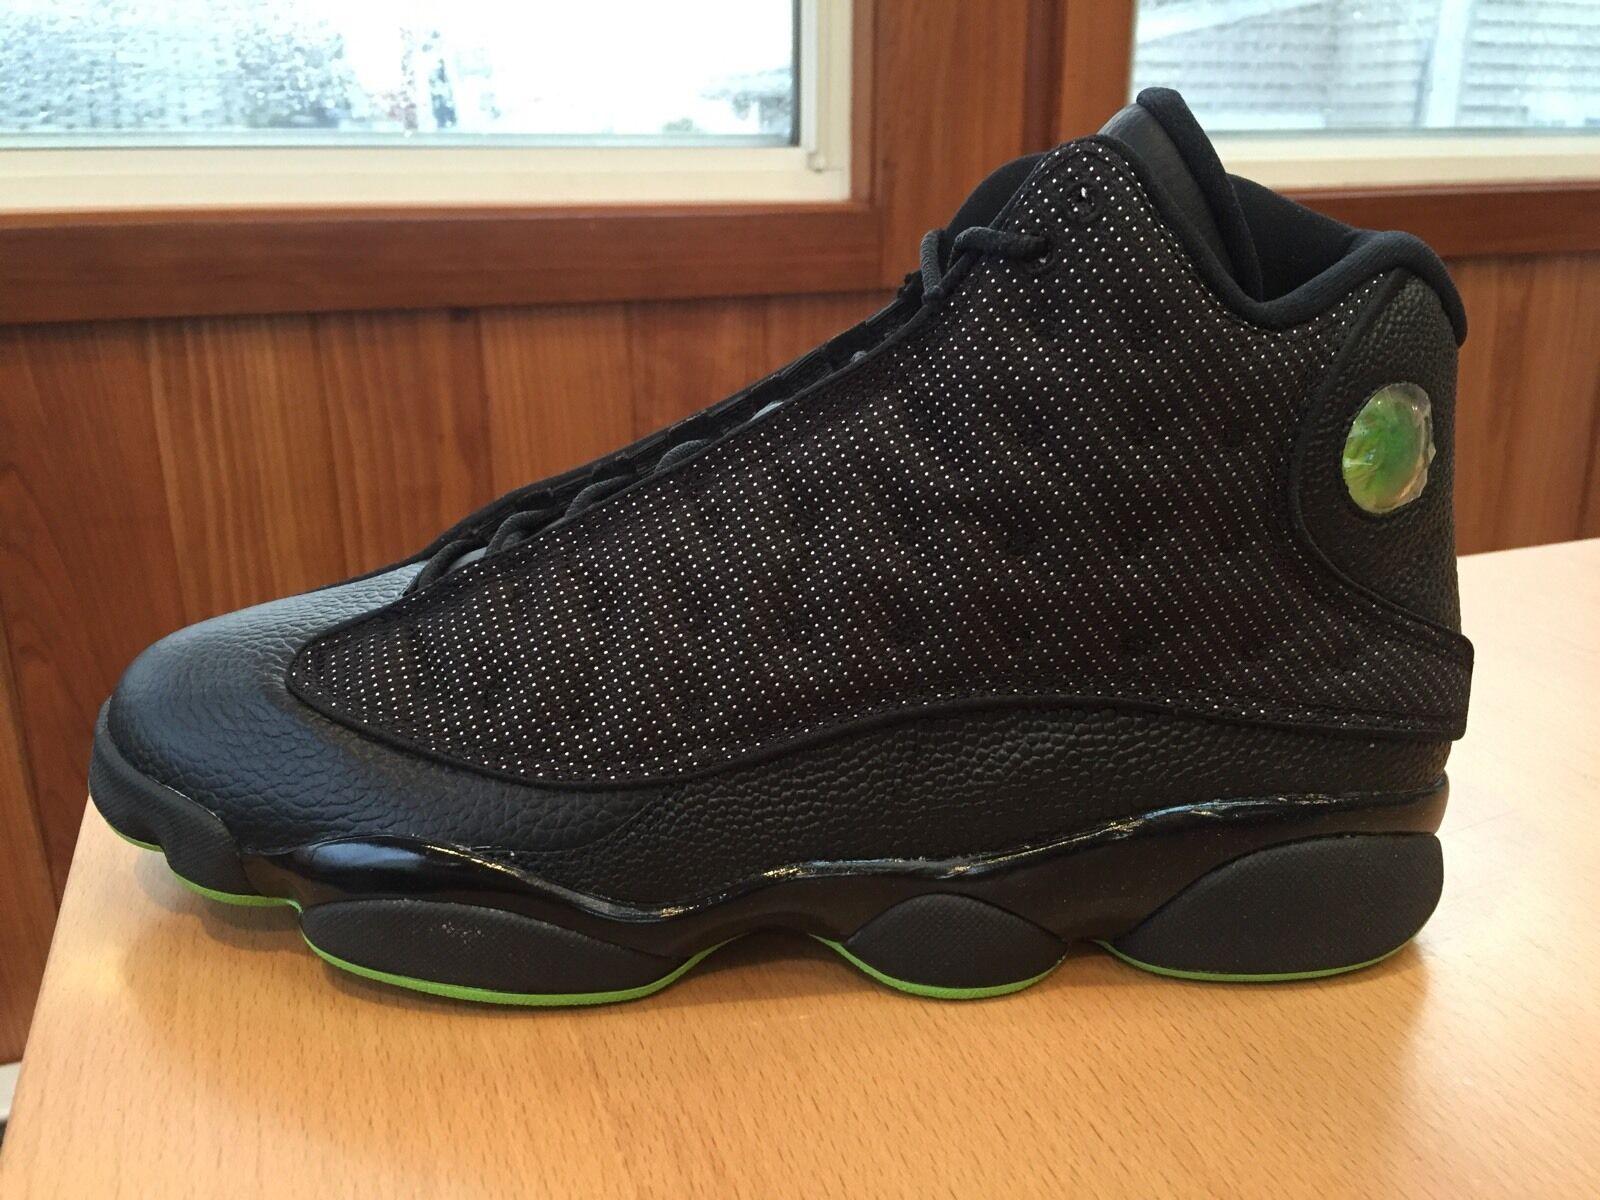 2010 Nike Air Jordan Reto XIII 13 Altitudes - DEADSTOCK Size 11 -414571-002